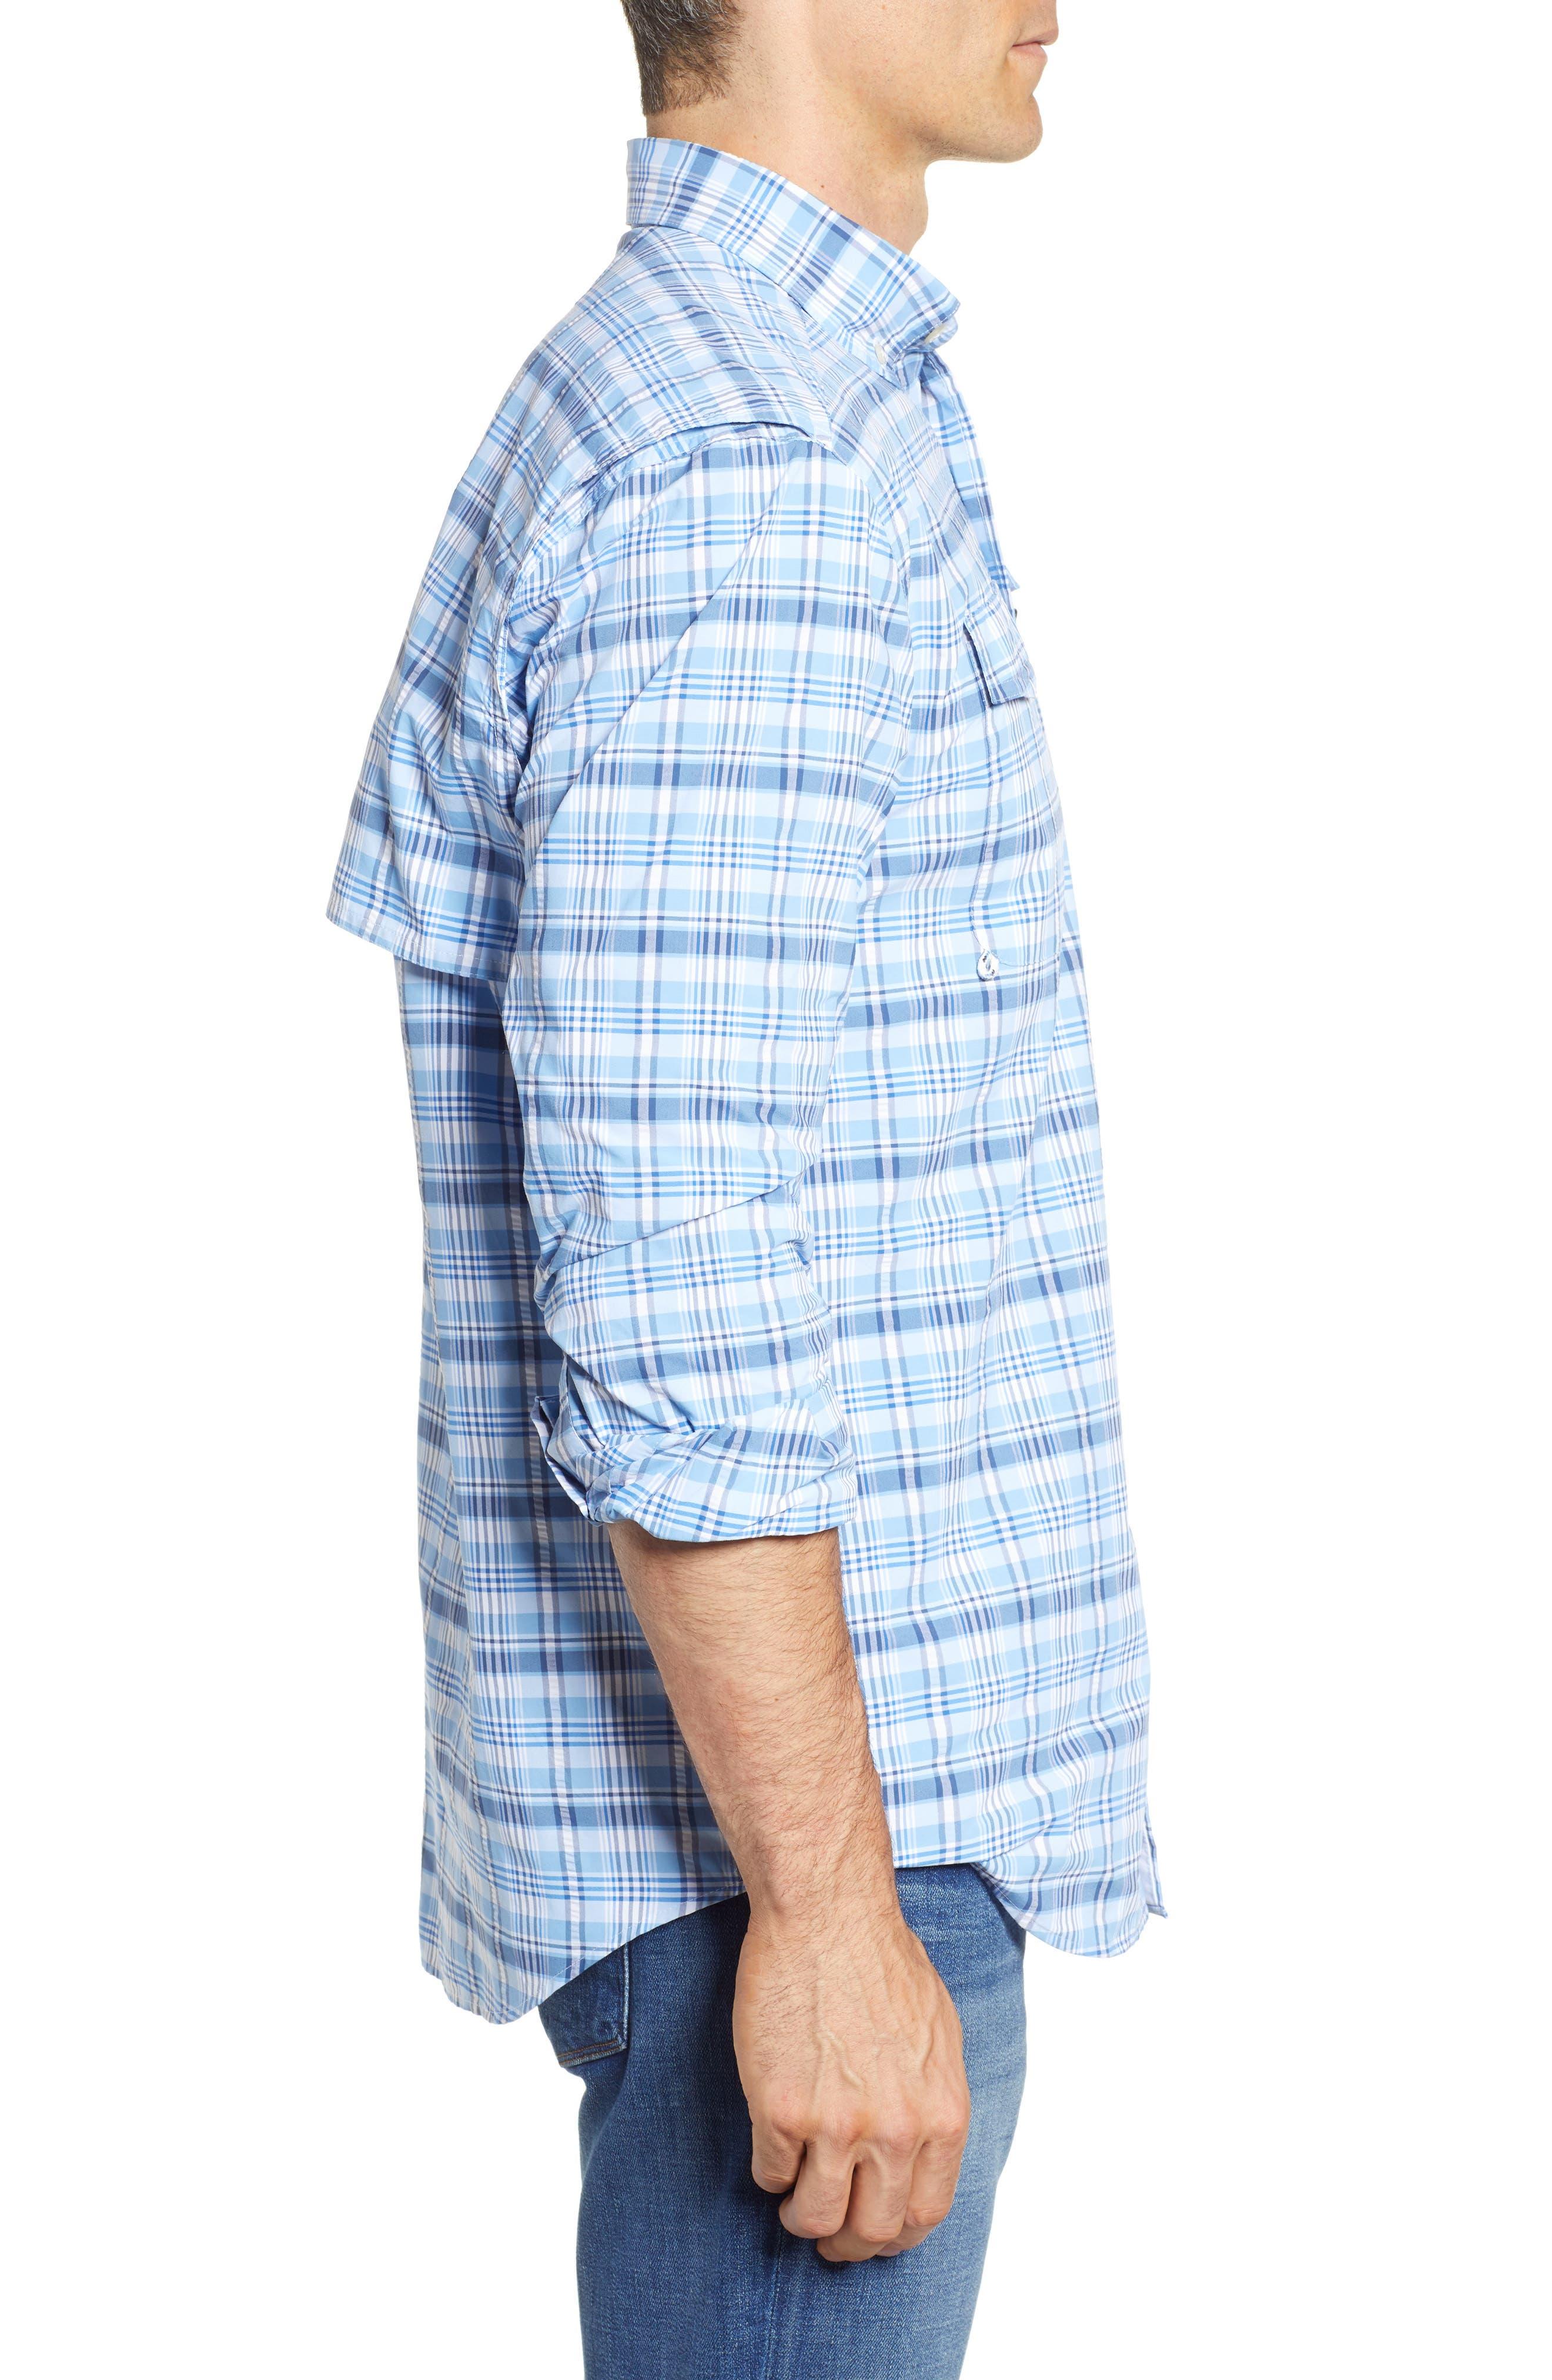 Prospect Hill Harbor Regular Fit Plaid Performance Sport Shirt,                             Alternate thumbnail 4, color,                             Ocean Breeze